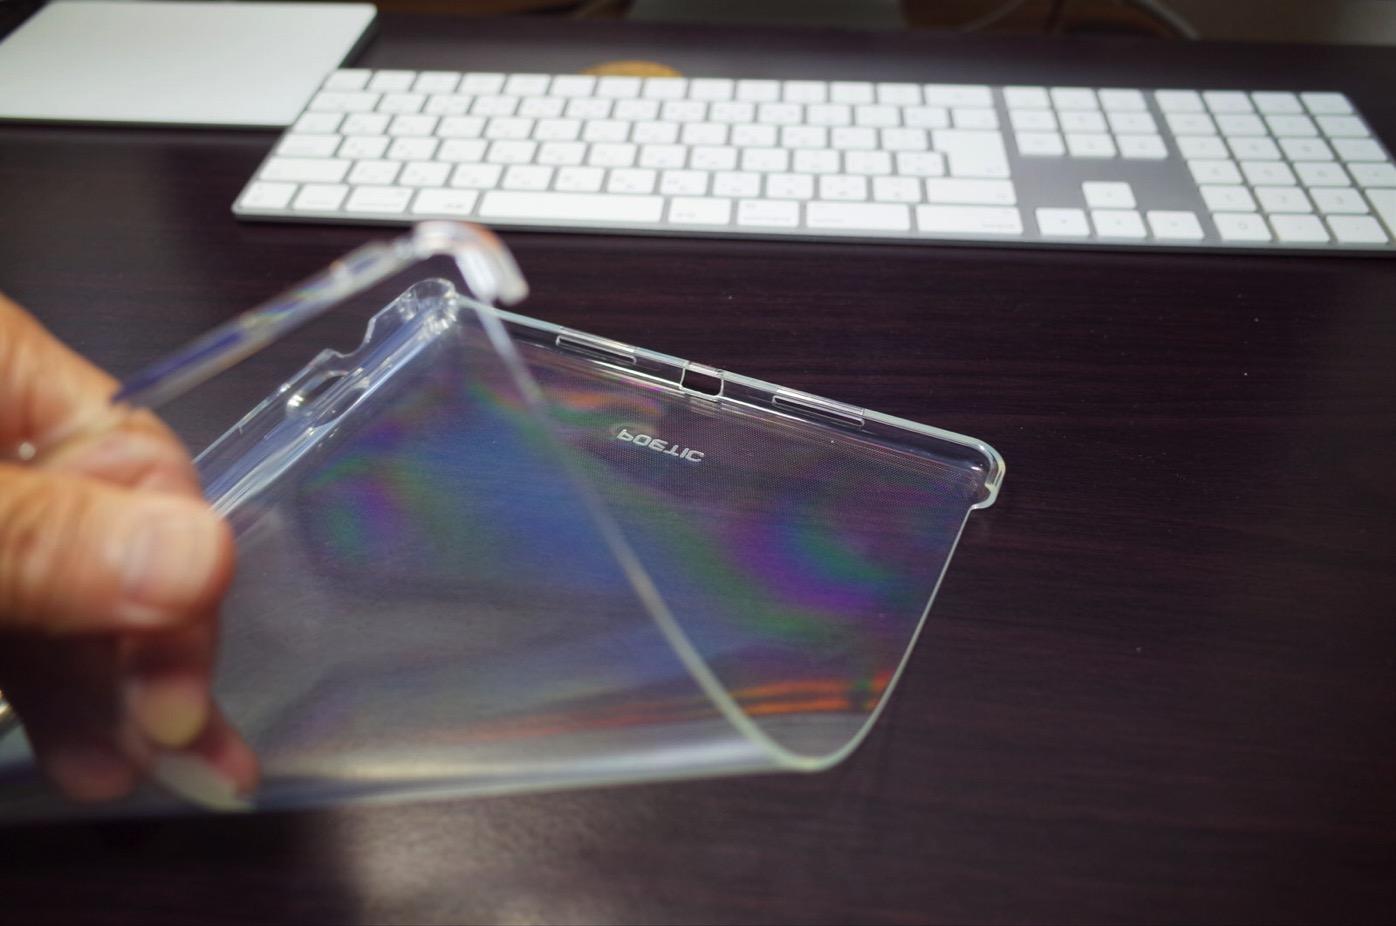 iPad Pro 10.5 ケース Poetic -[Lumos Series]- アップル 10.5型 アイパッド プロ 対応 [ウルトラスリム] [TPU製 ケース] Smart Keyboard 対応 Apple Pencil 収納スロット付き (クリスタルクリア)-6